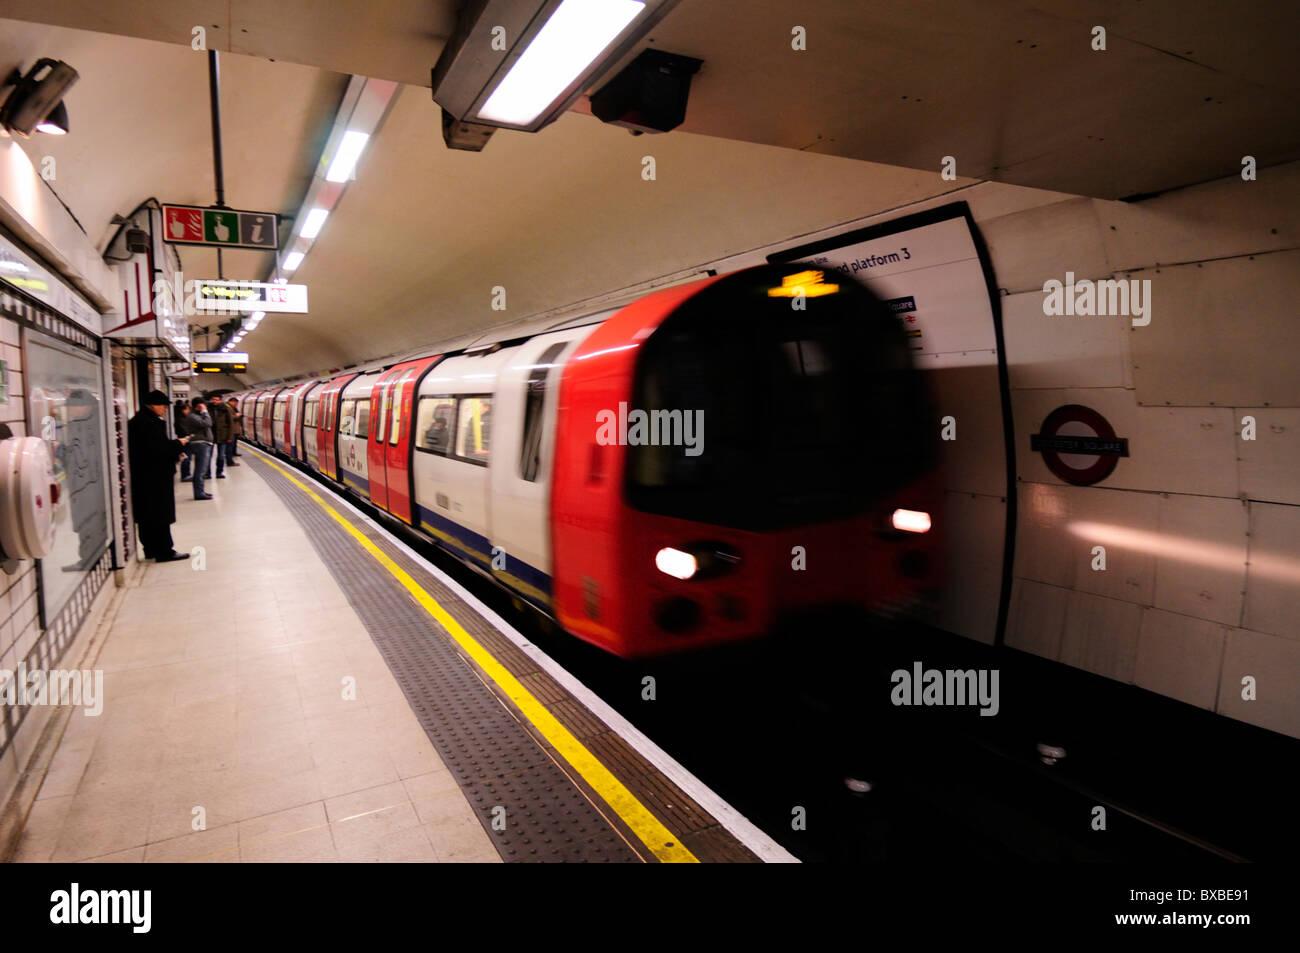 Leicester Square Underground Tube Station Northern Line Platform, London, England, UK - Stock Image